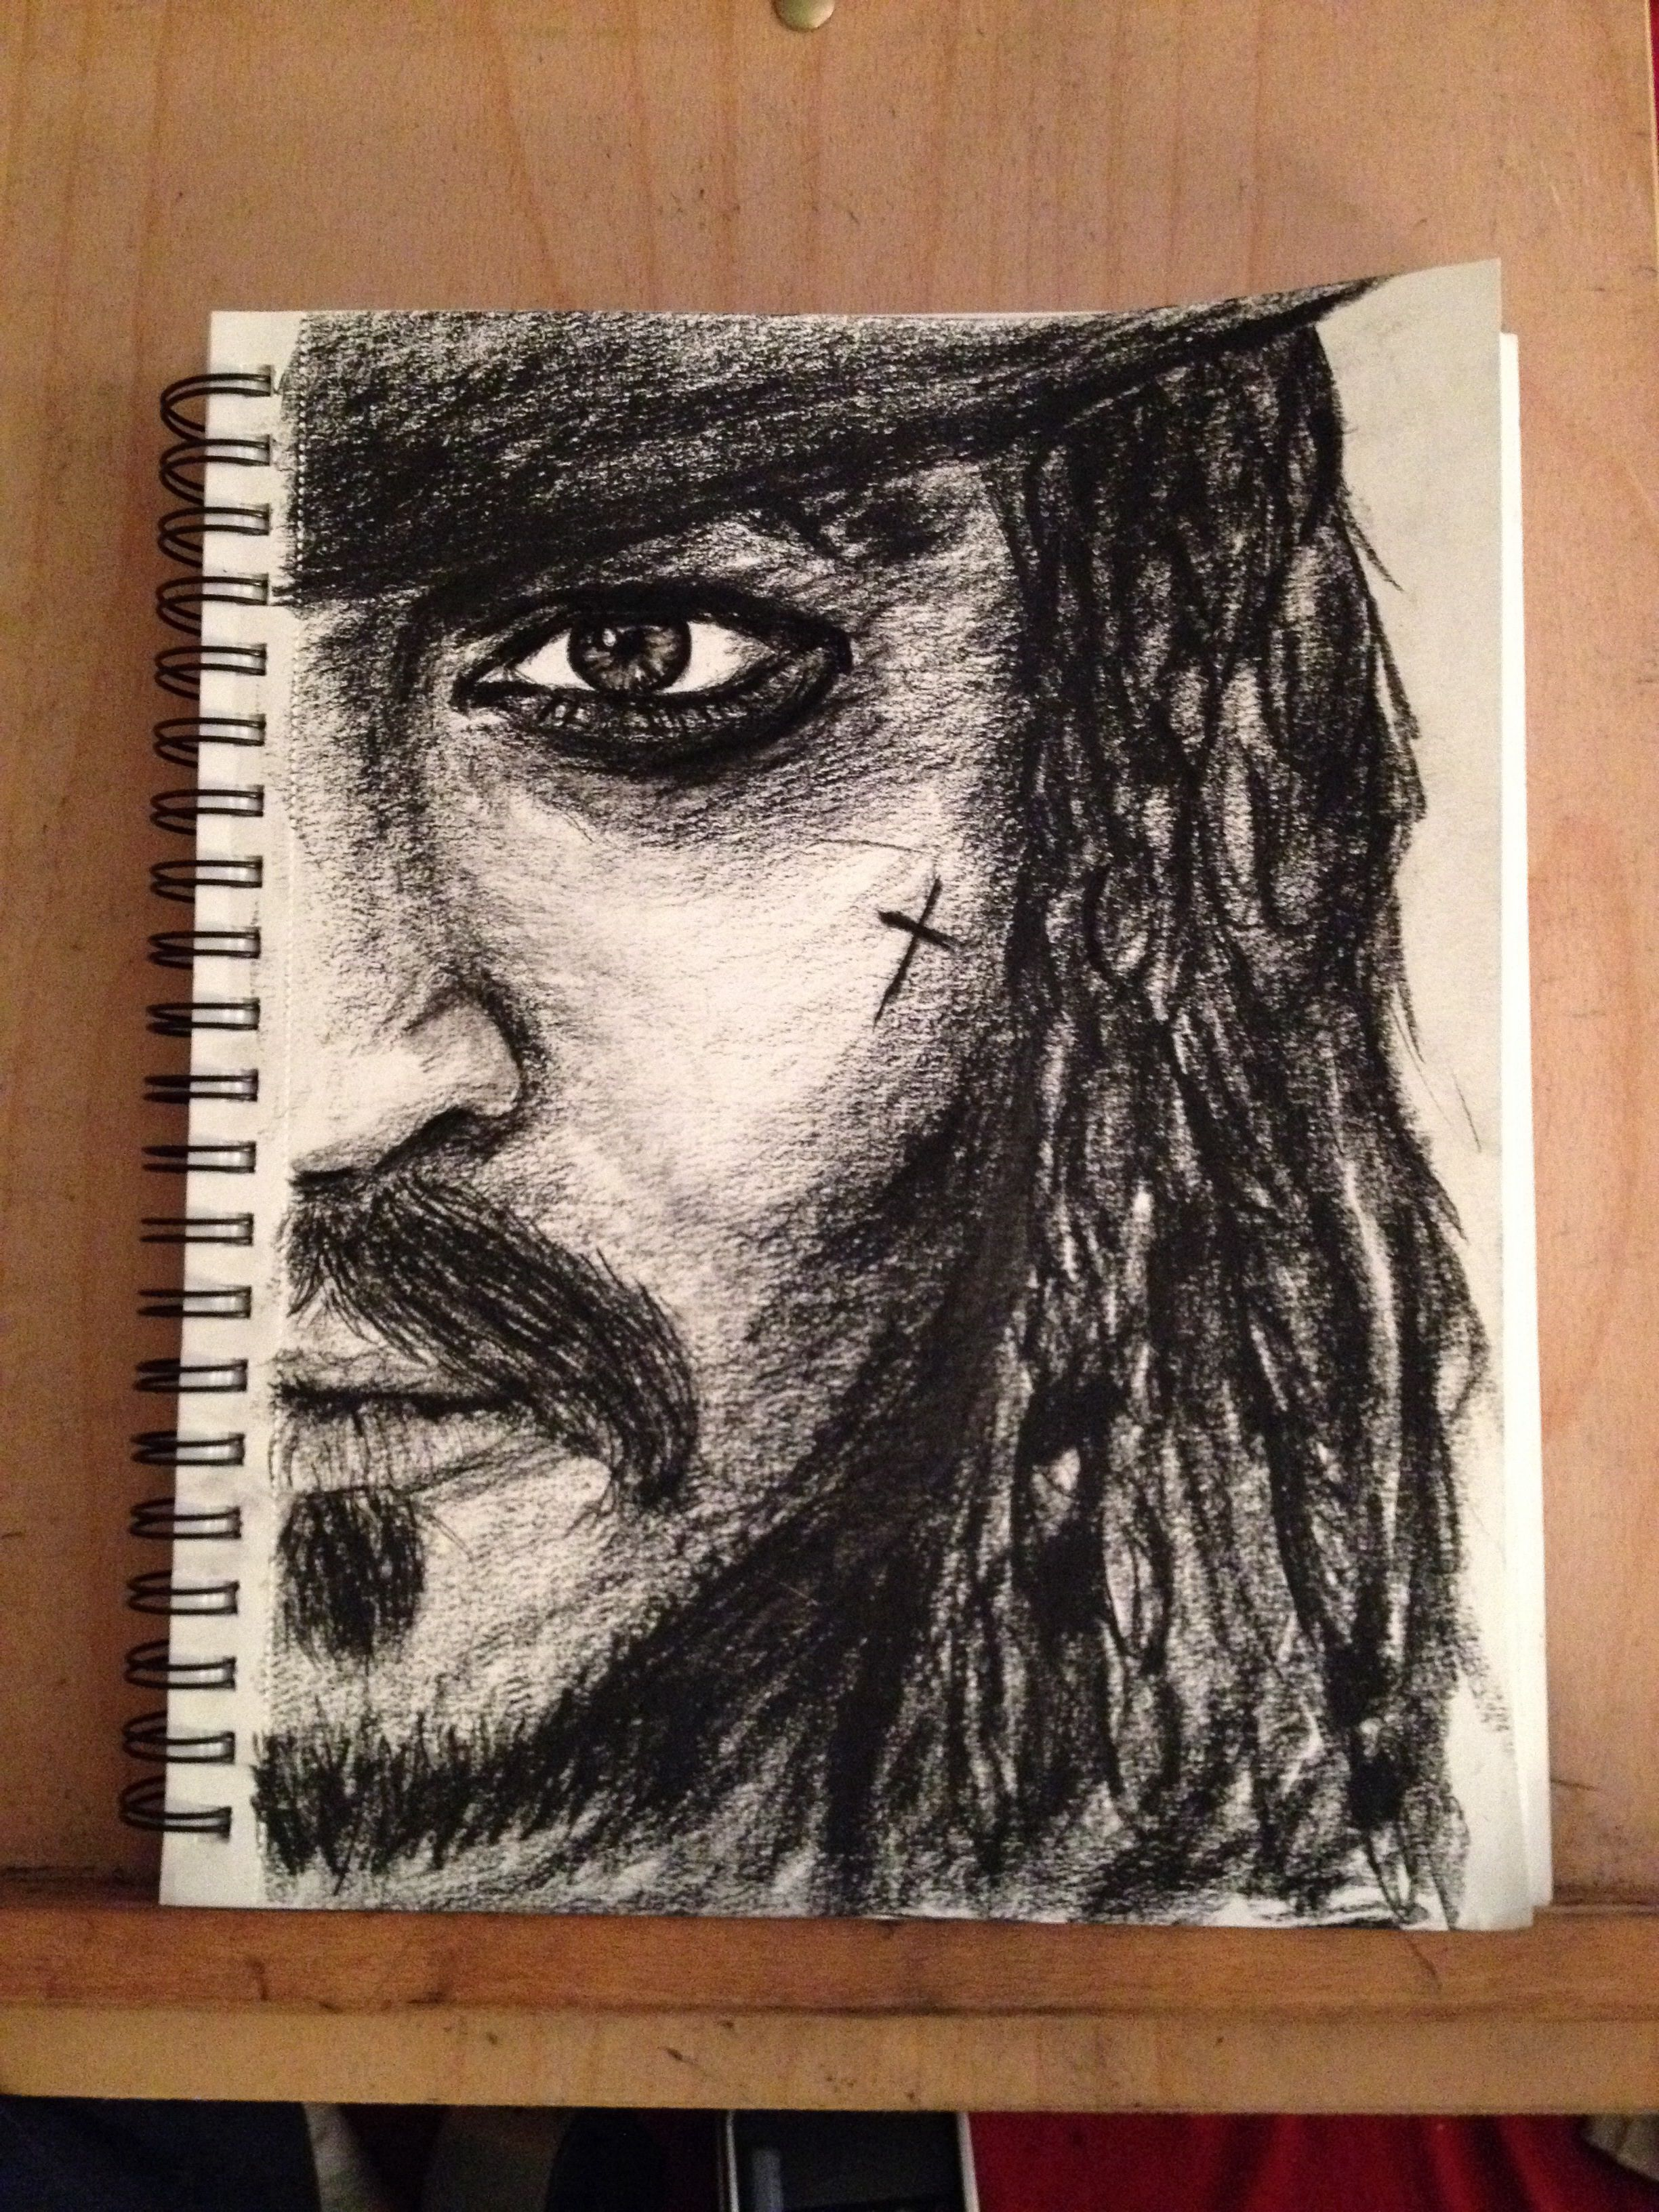 Charcoal art jack sparrow (Johnny Depp) | My arts and ...